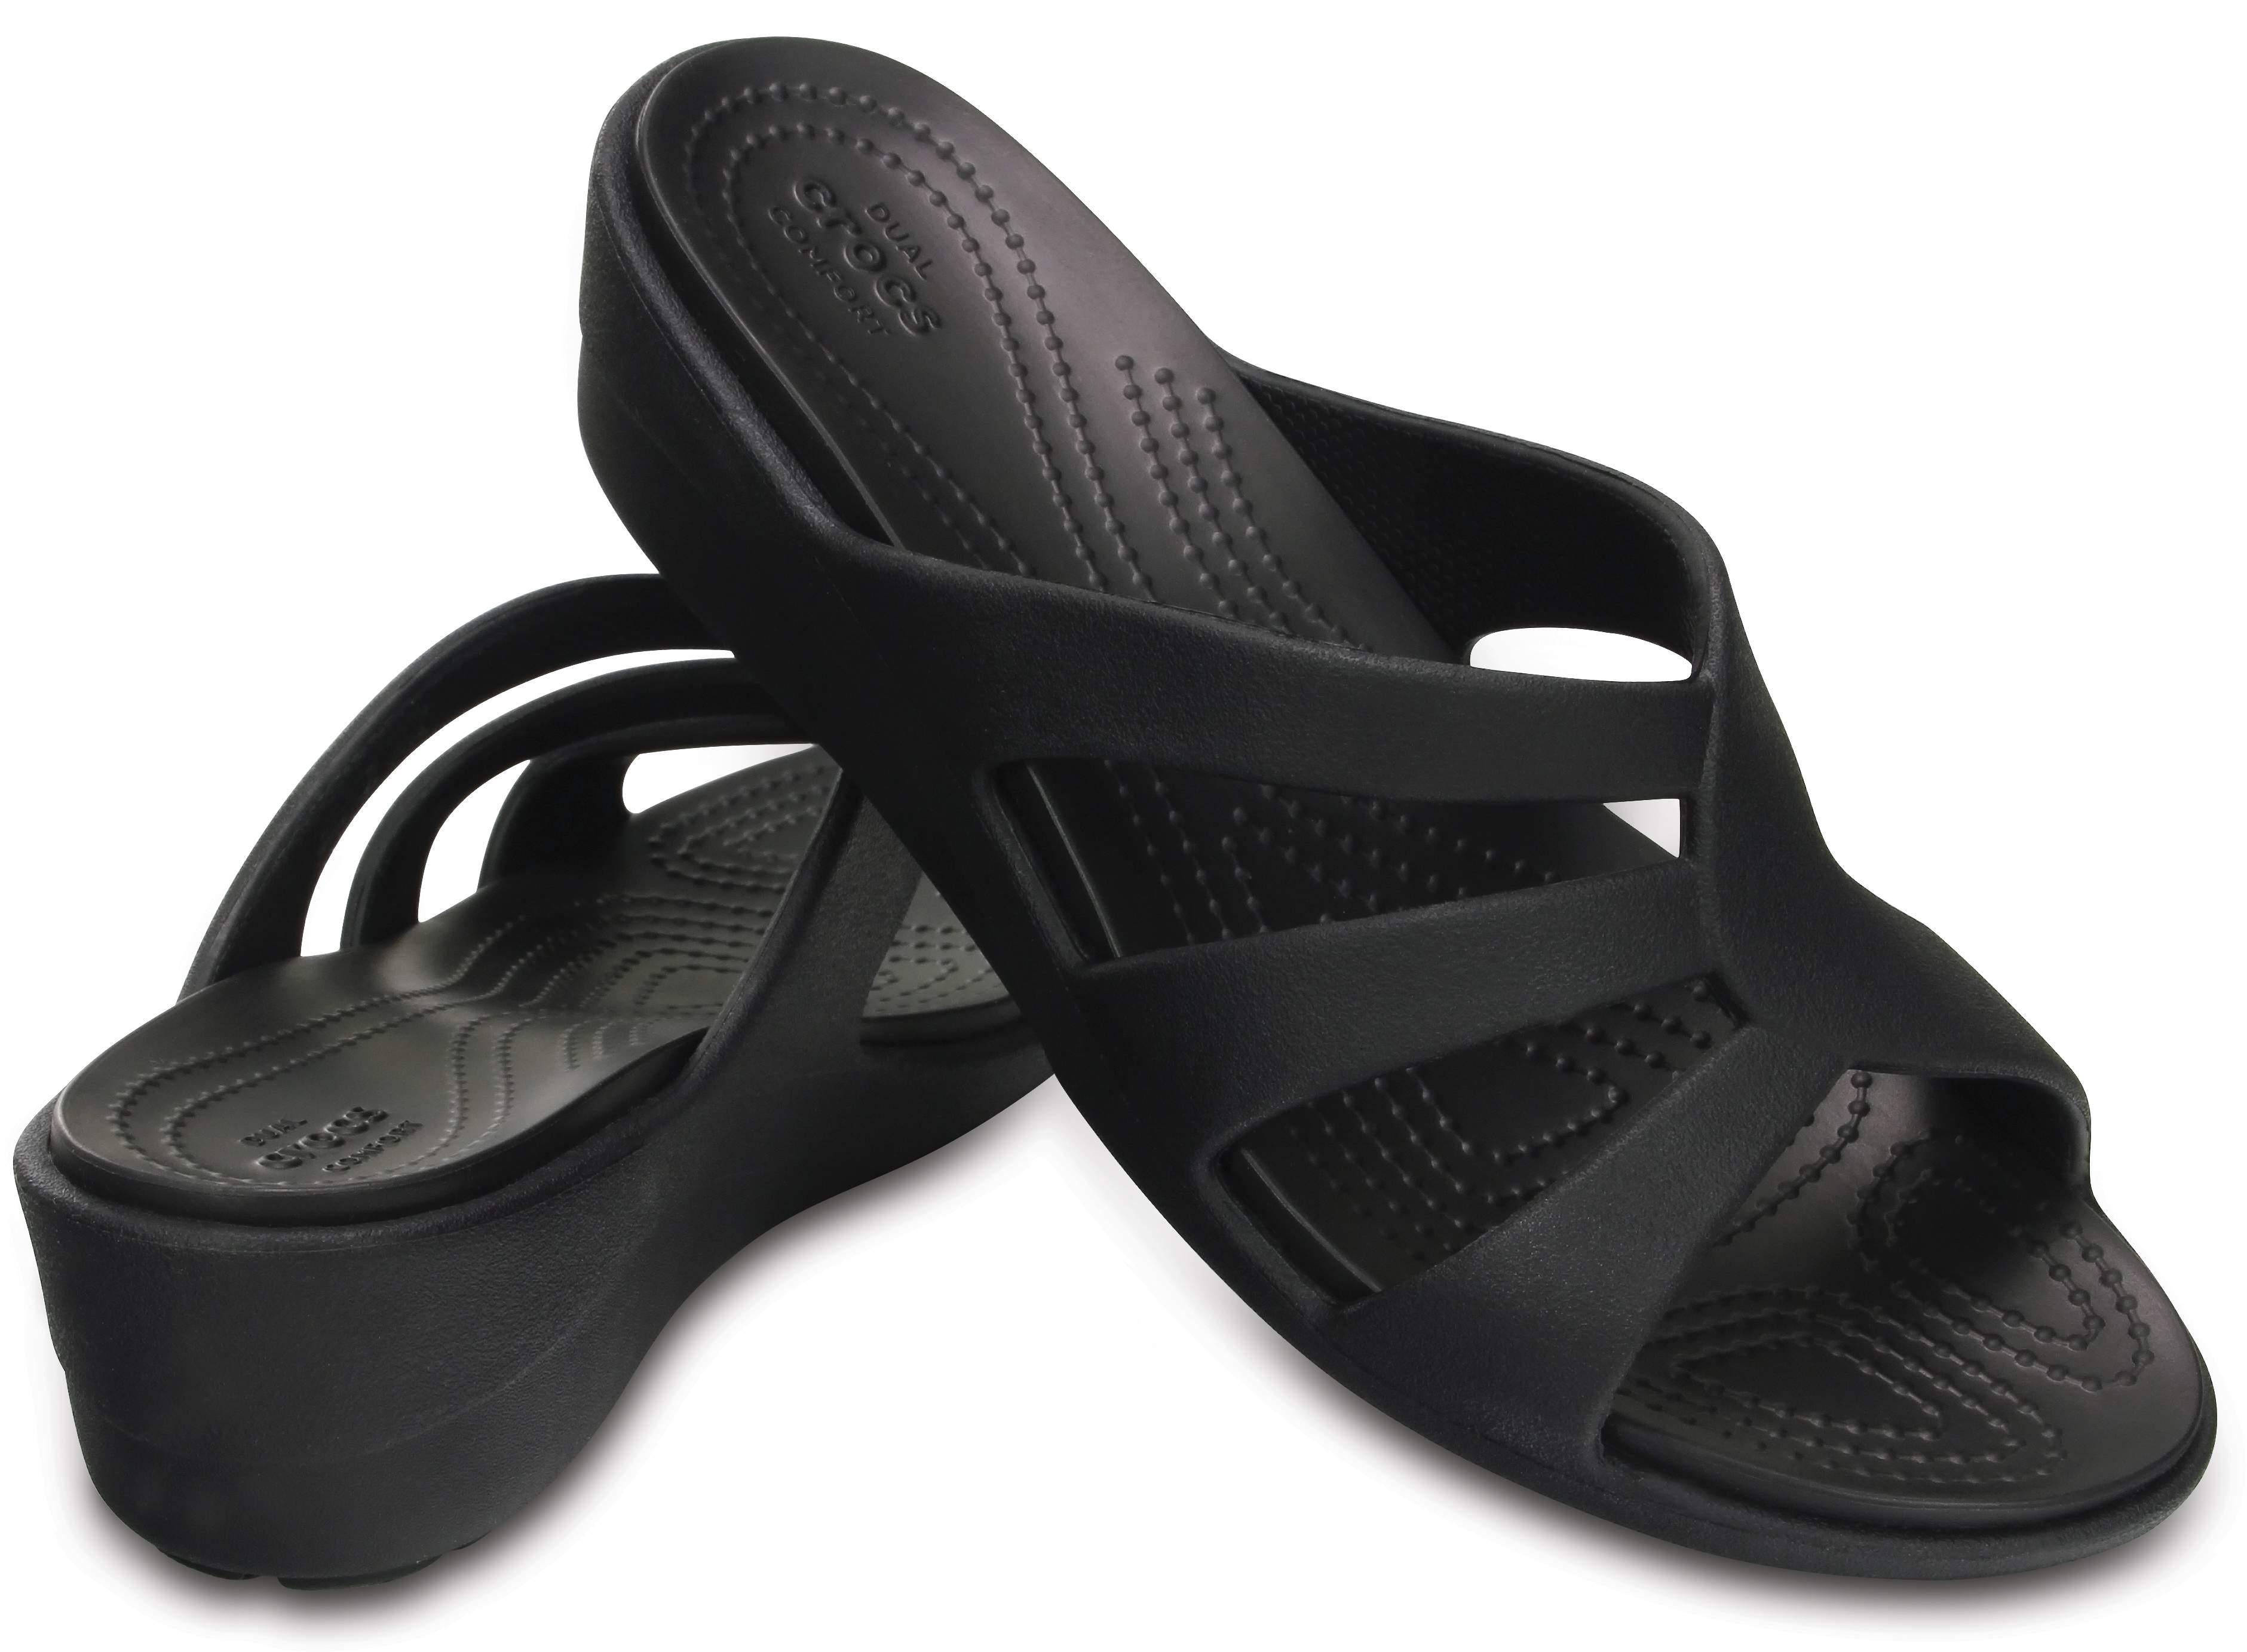 Crocs Sanrah Women's Strappy ... Wedge Sandals